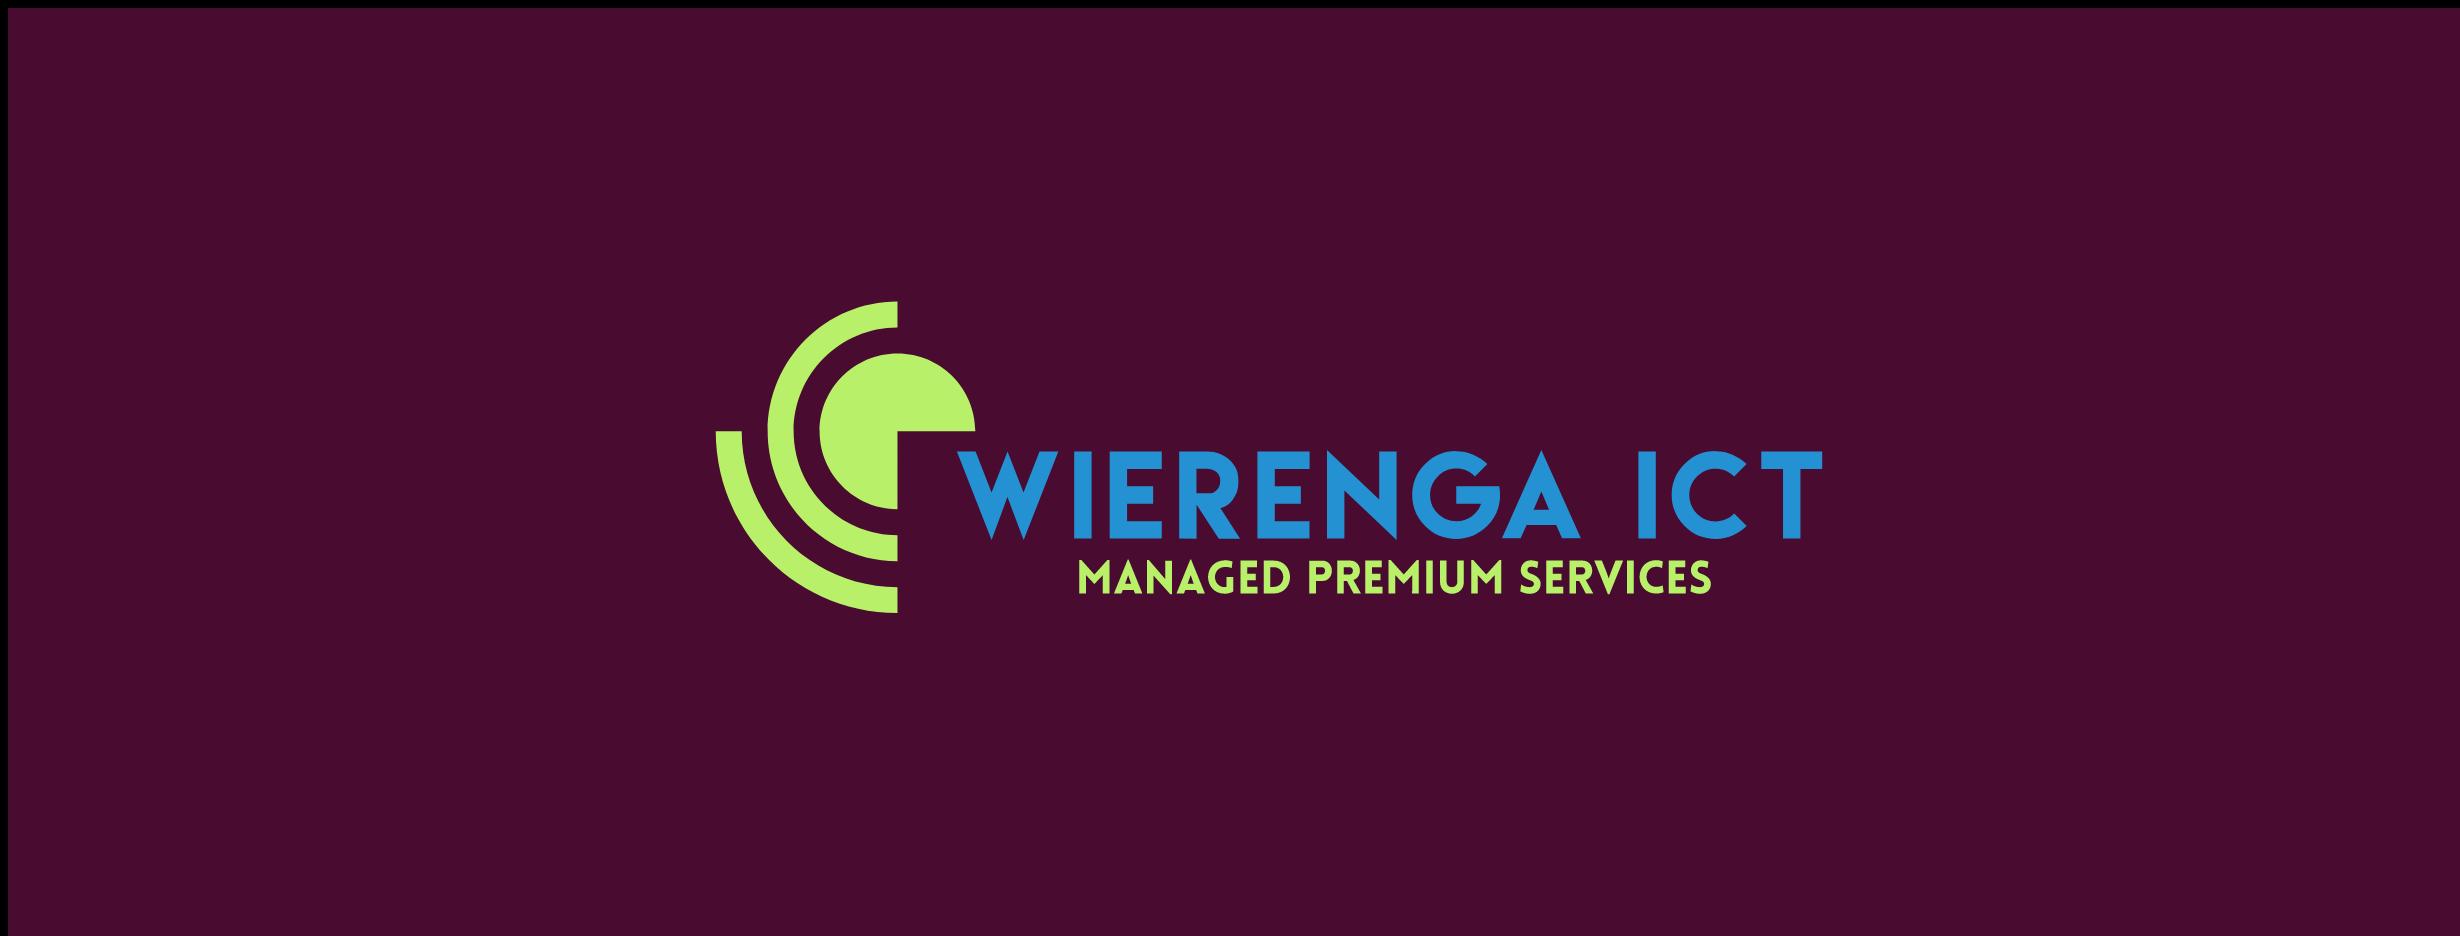 Wierenga ICT - logo